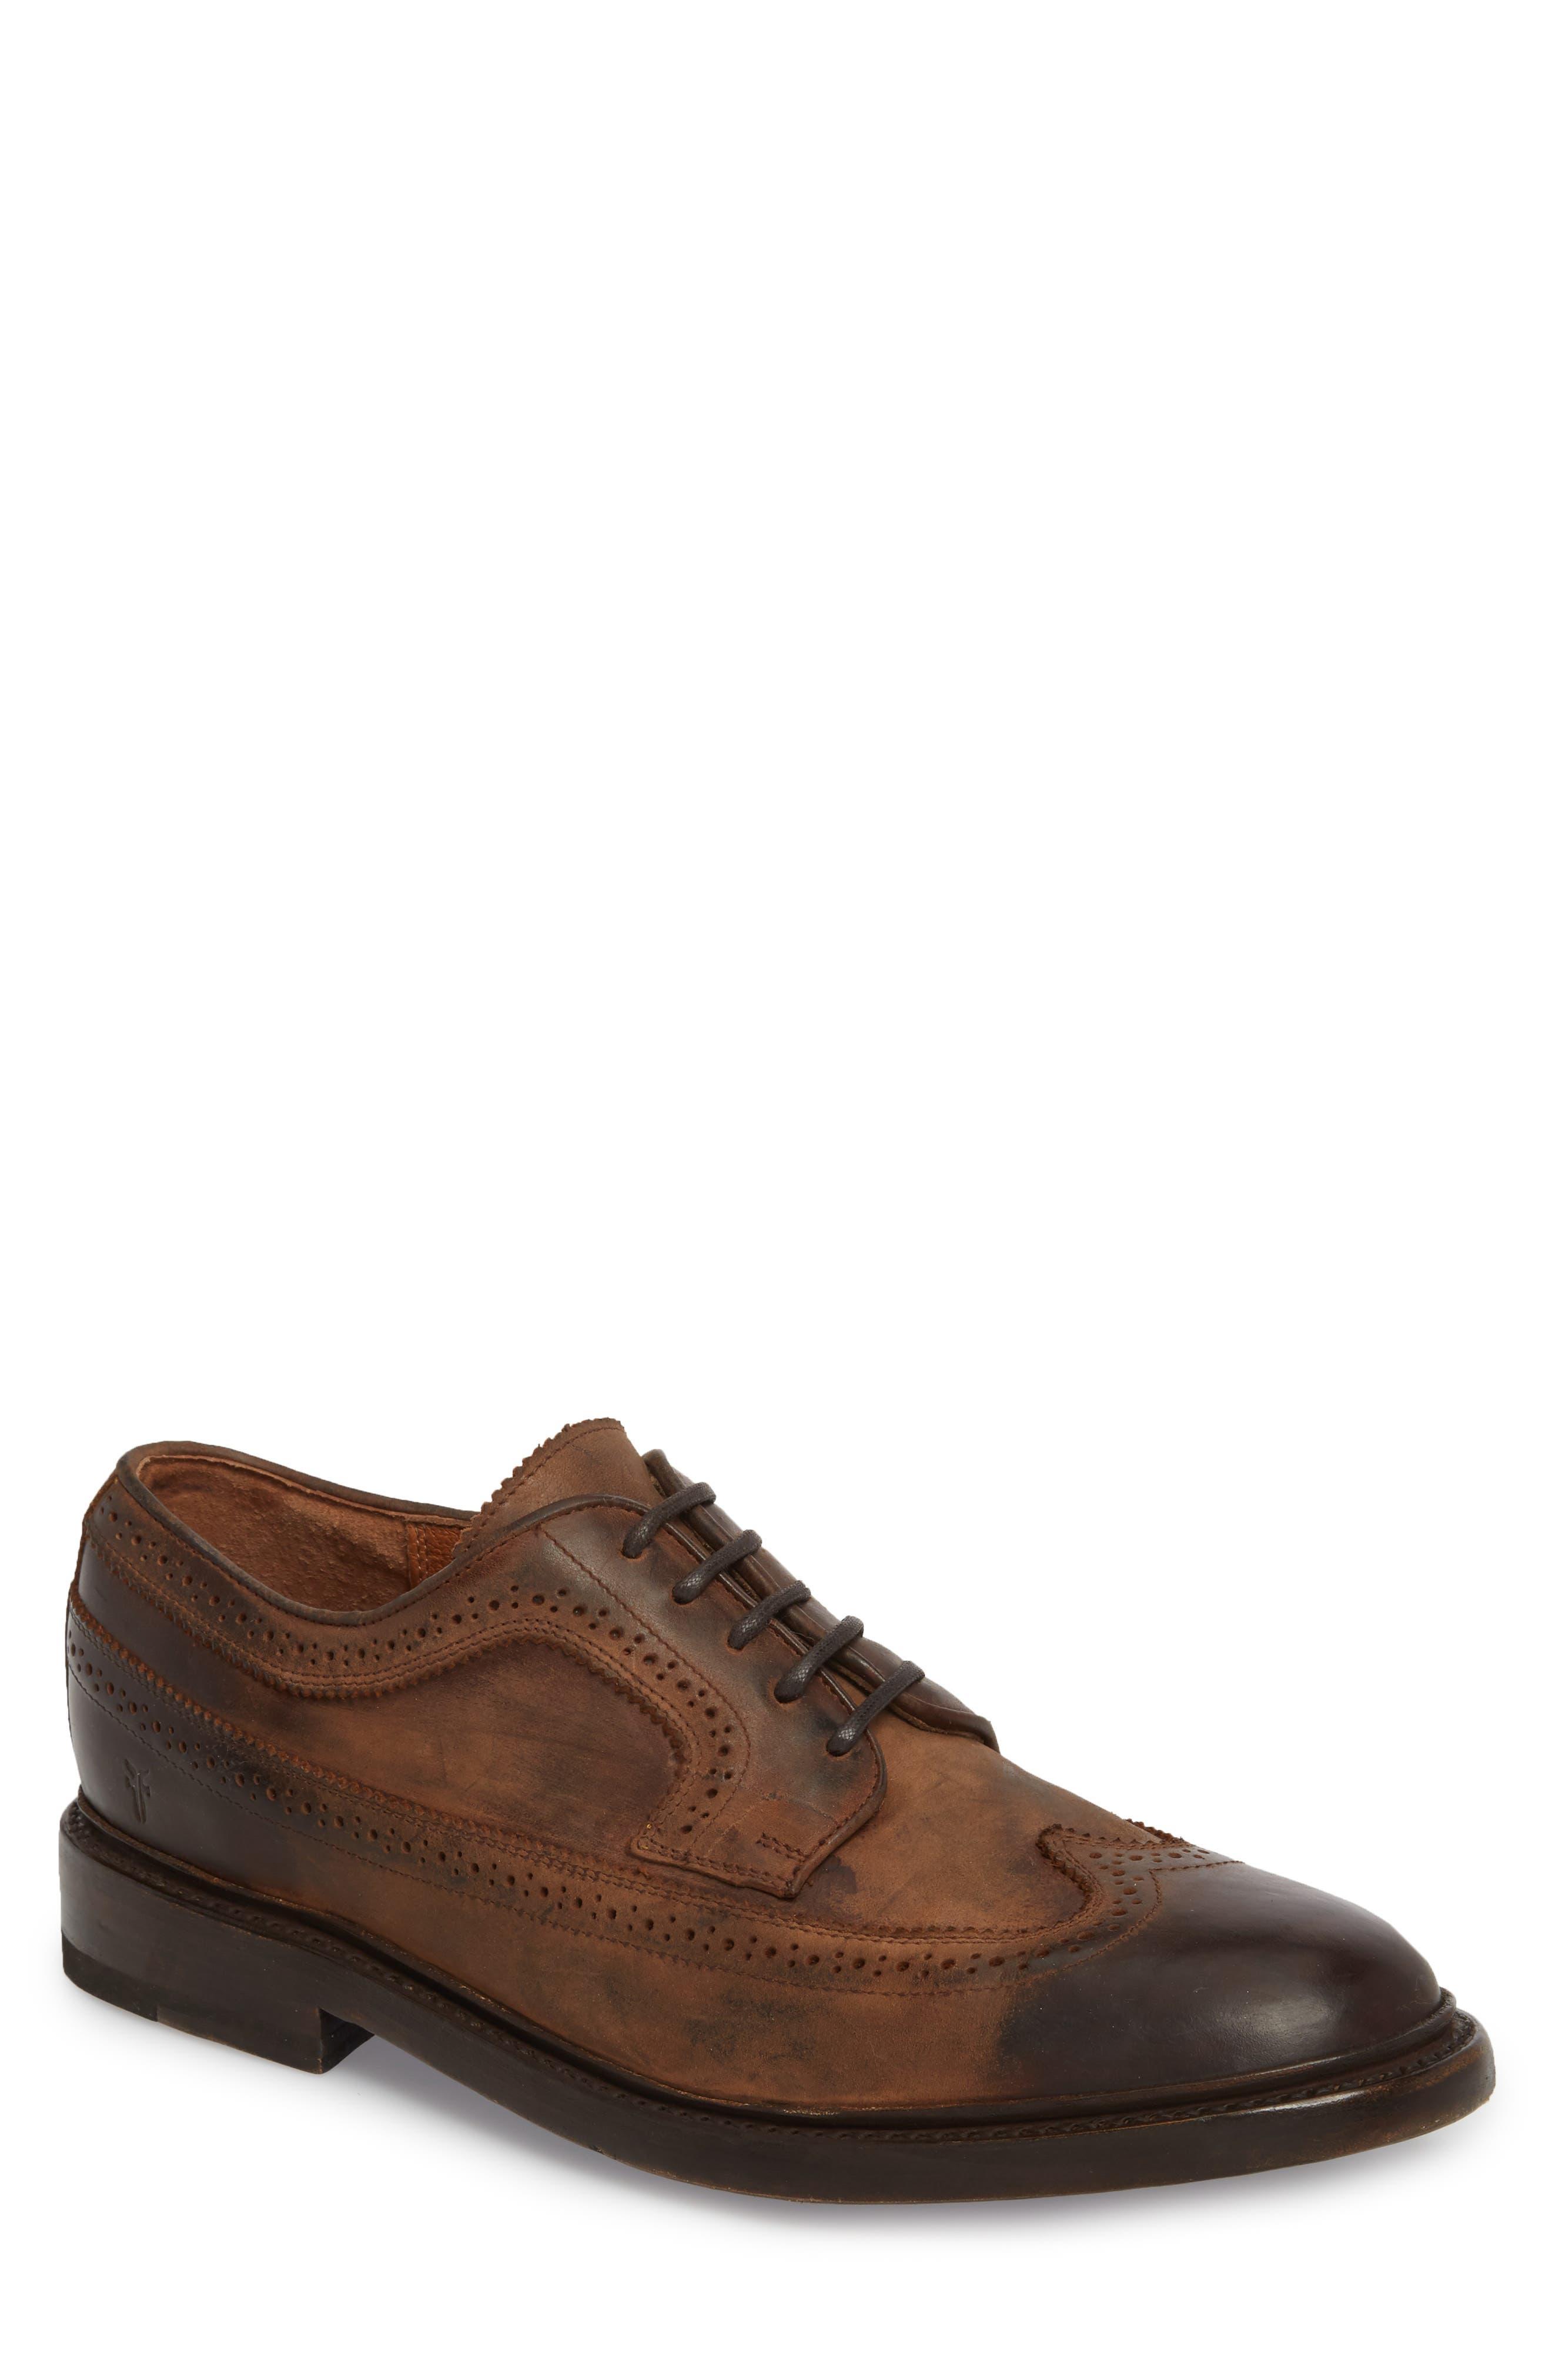 Jones Wingtip,                         Main,                         color, Redwood Leather